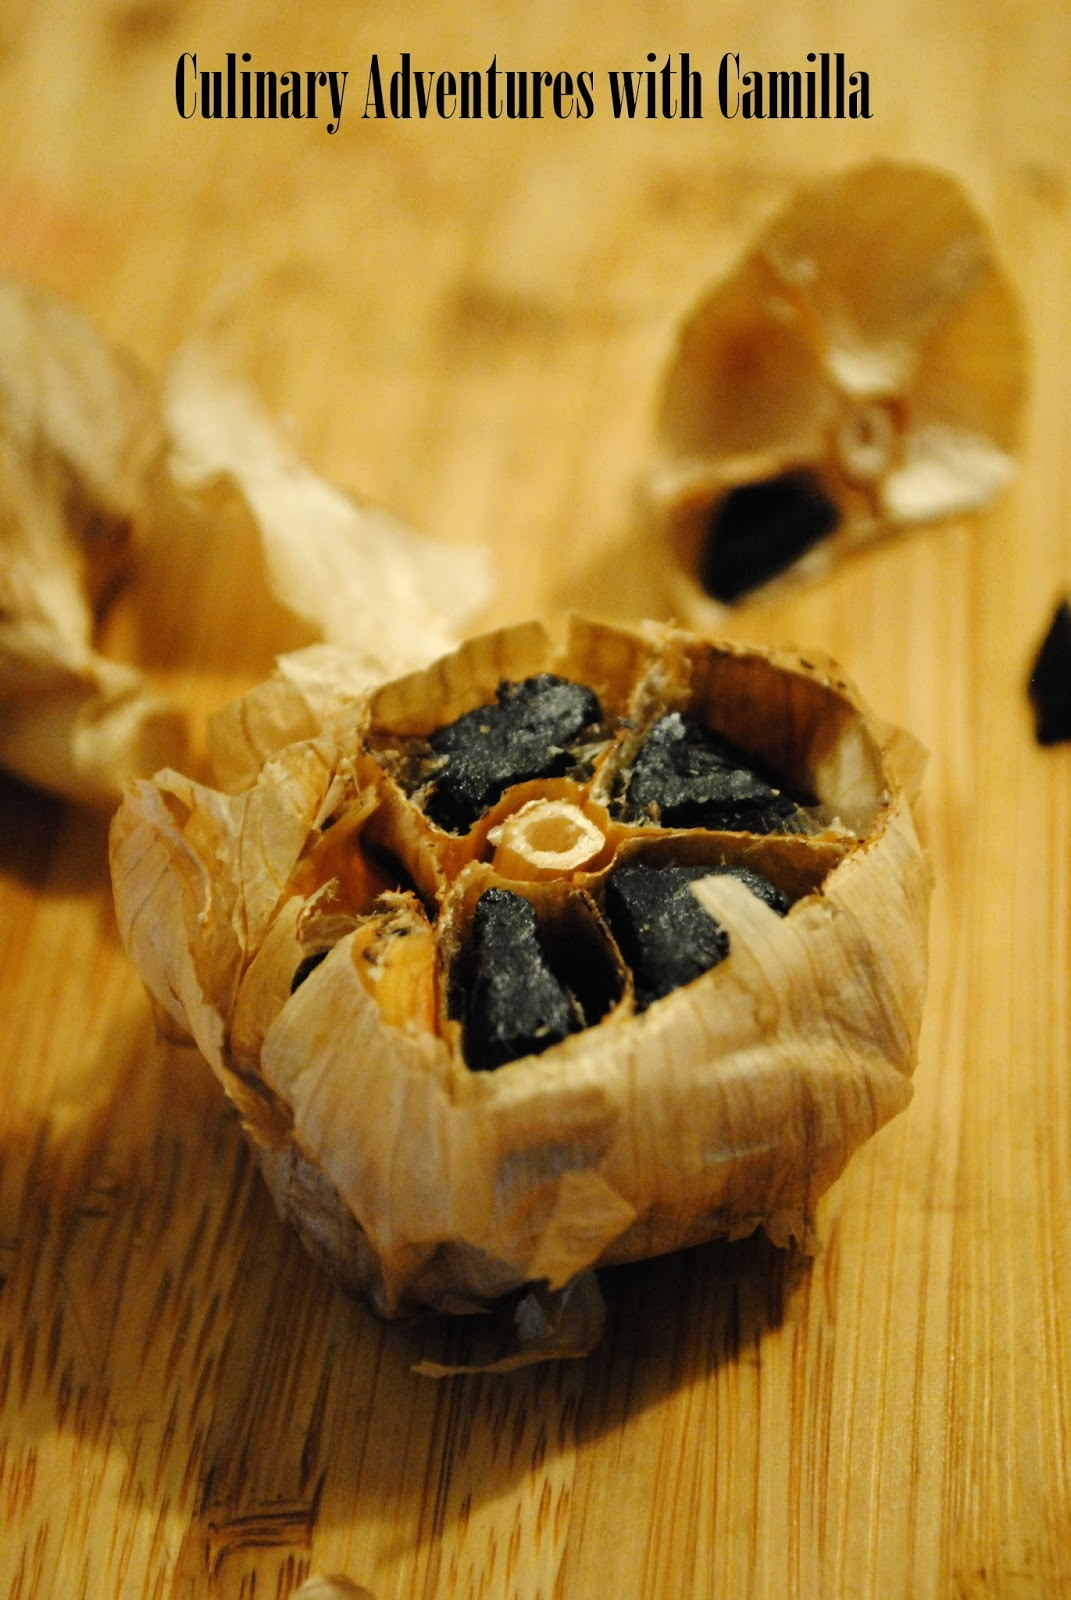 Garlic cake recipe